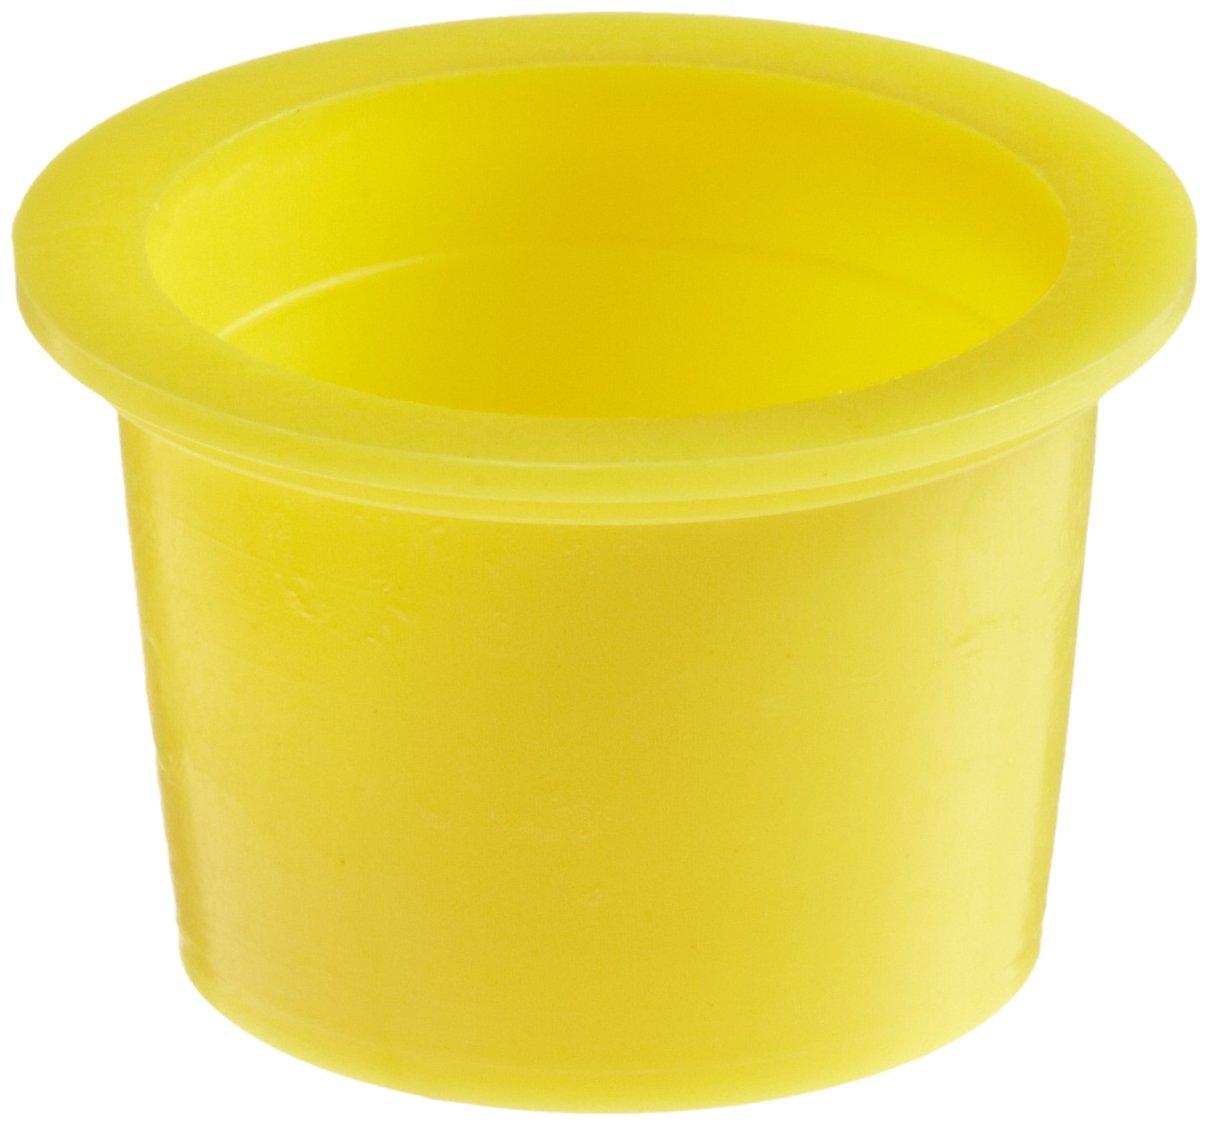 Yellow 28.0 mm Tube OD Poppelman Plastics 61000200000 Kapsto 610 U 20 Polyethylene Universal Protection Pack of 100